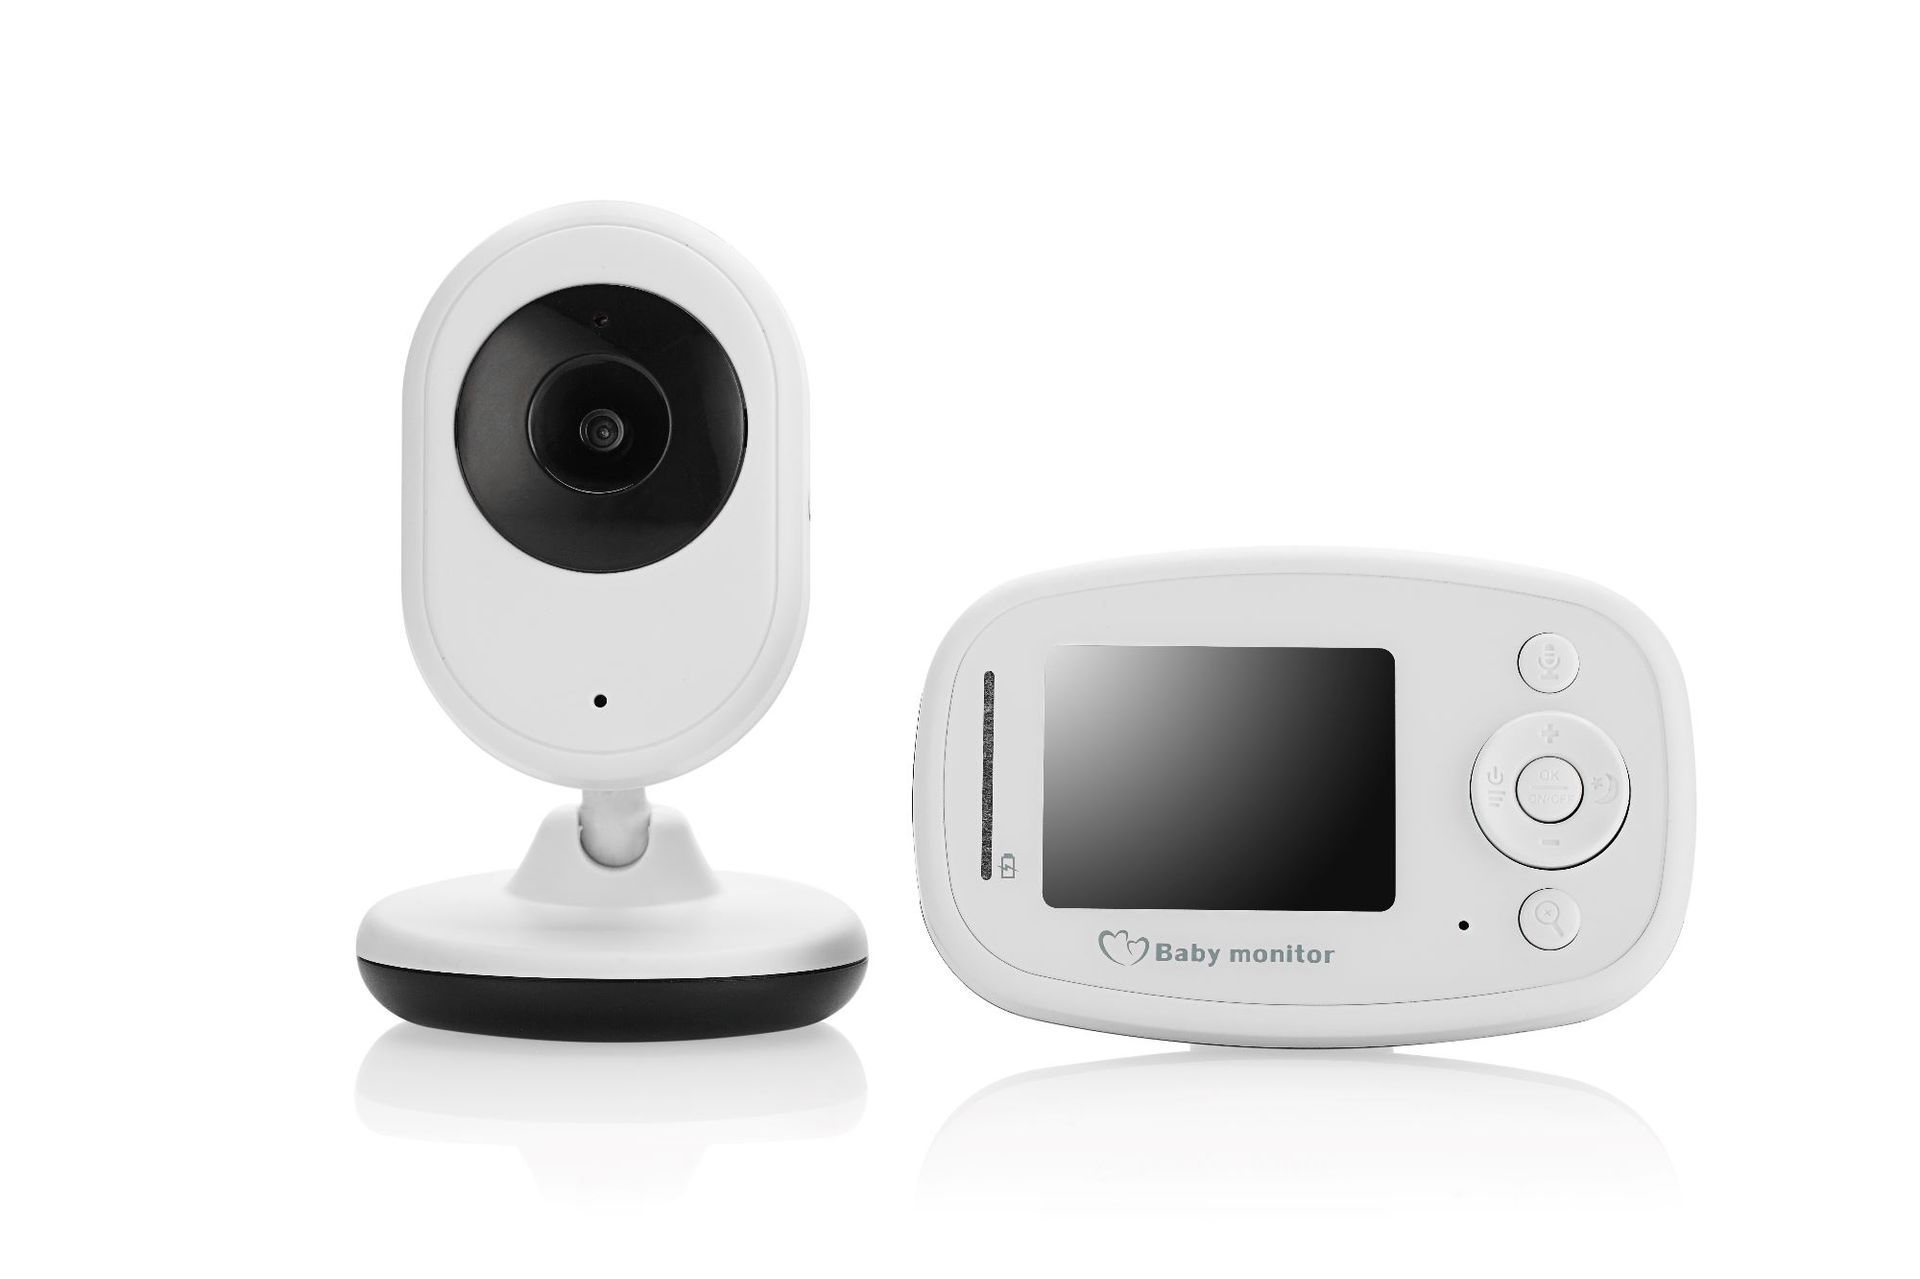 SP820 Wireless Baby Surveillance Camera Digital Caregiver Supports Intercom Room Temperature Display Lullaby Singing AU Plug